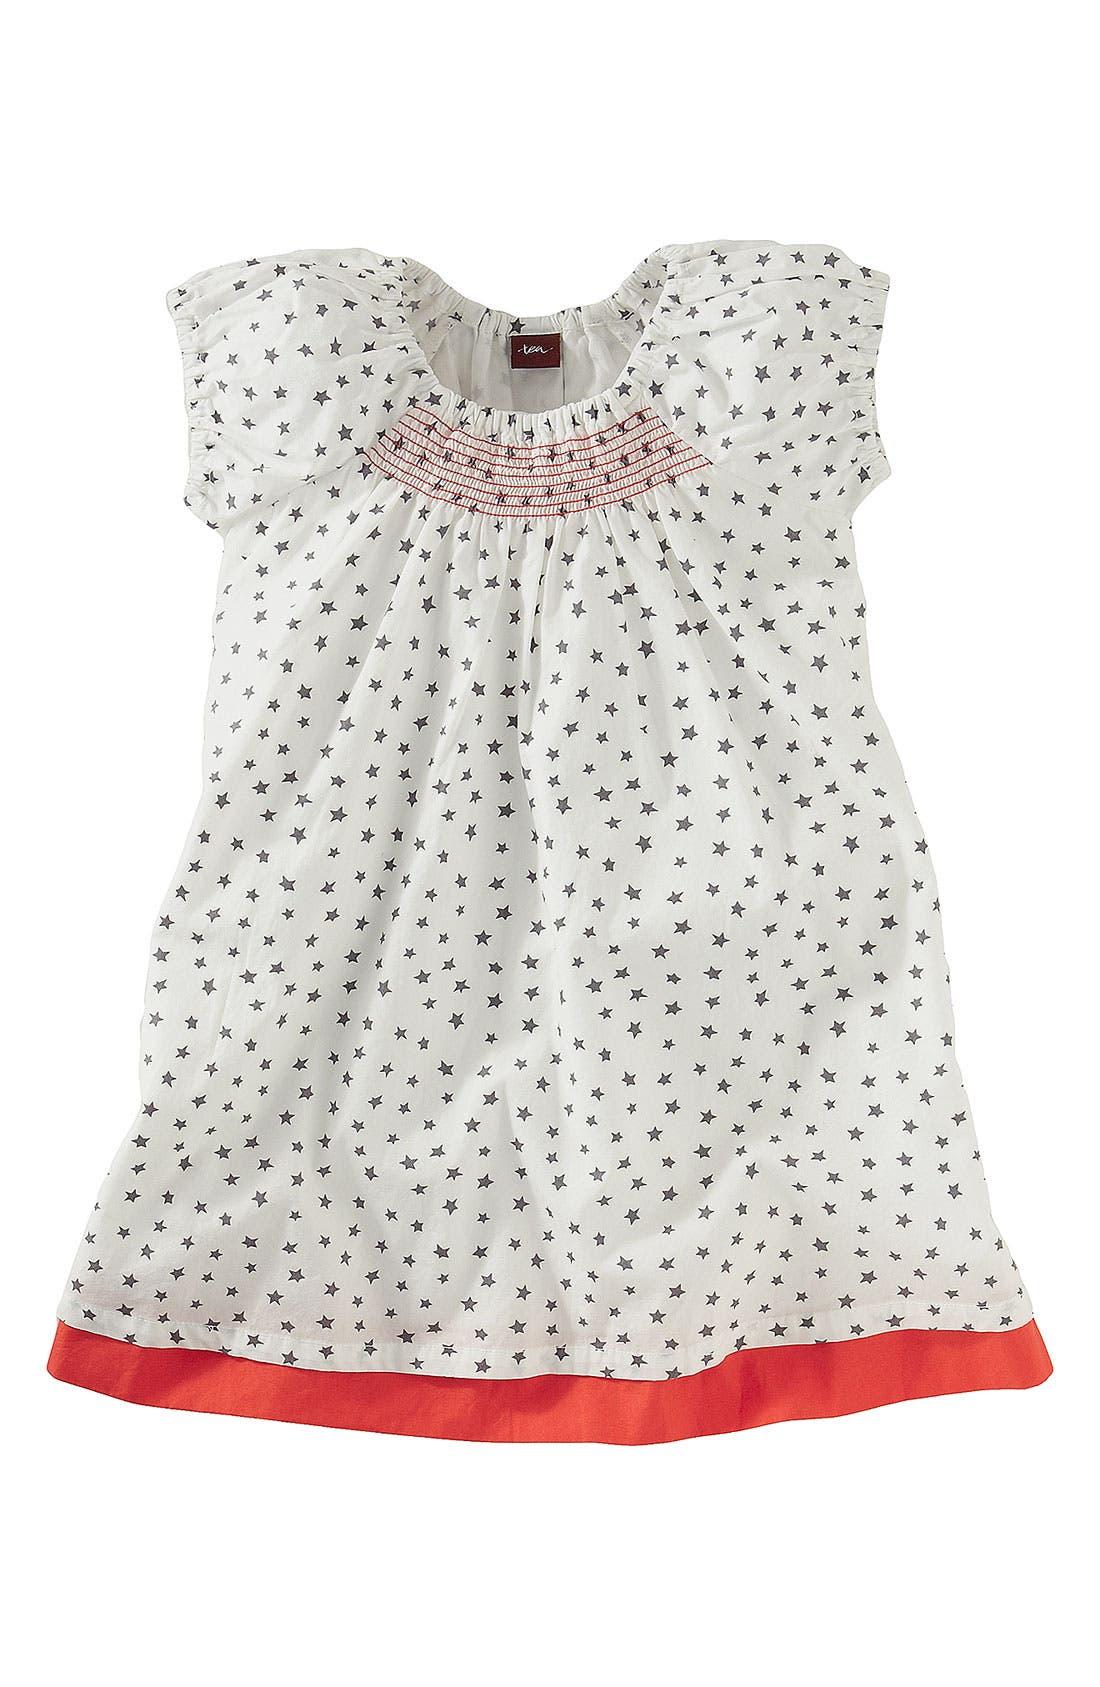 Main Image - Tea Collection Smocked Dress (Toddler)